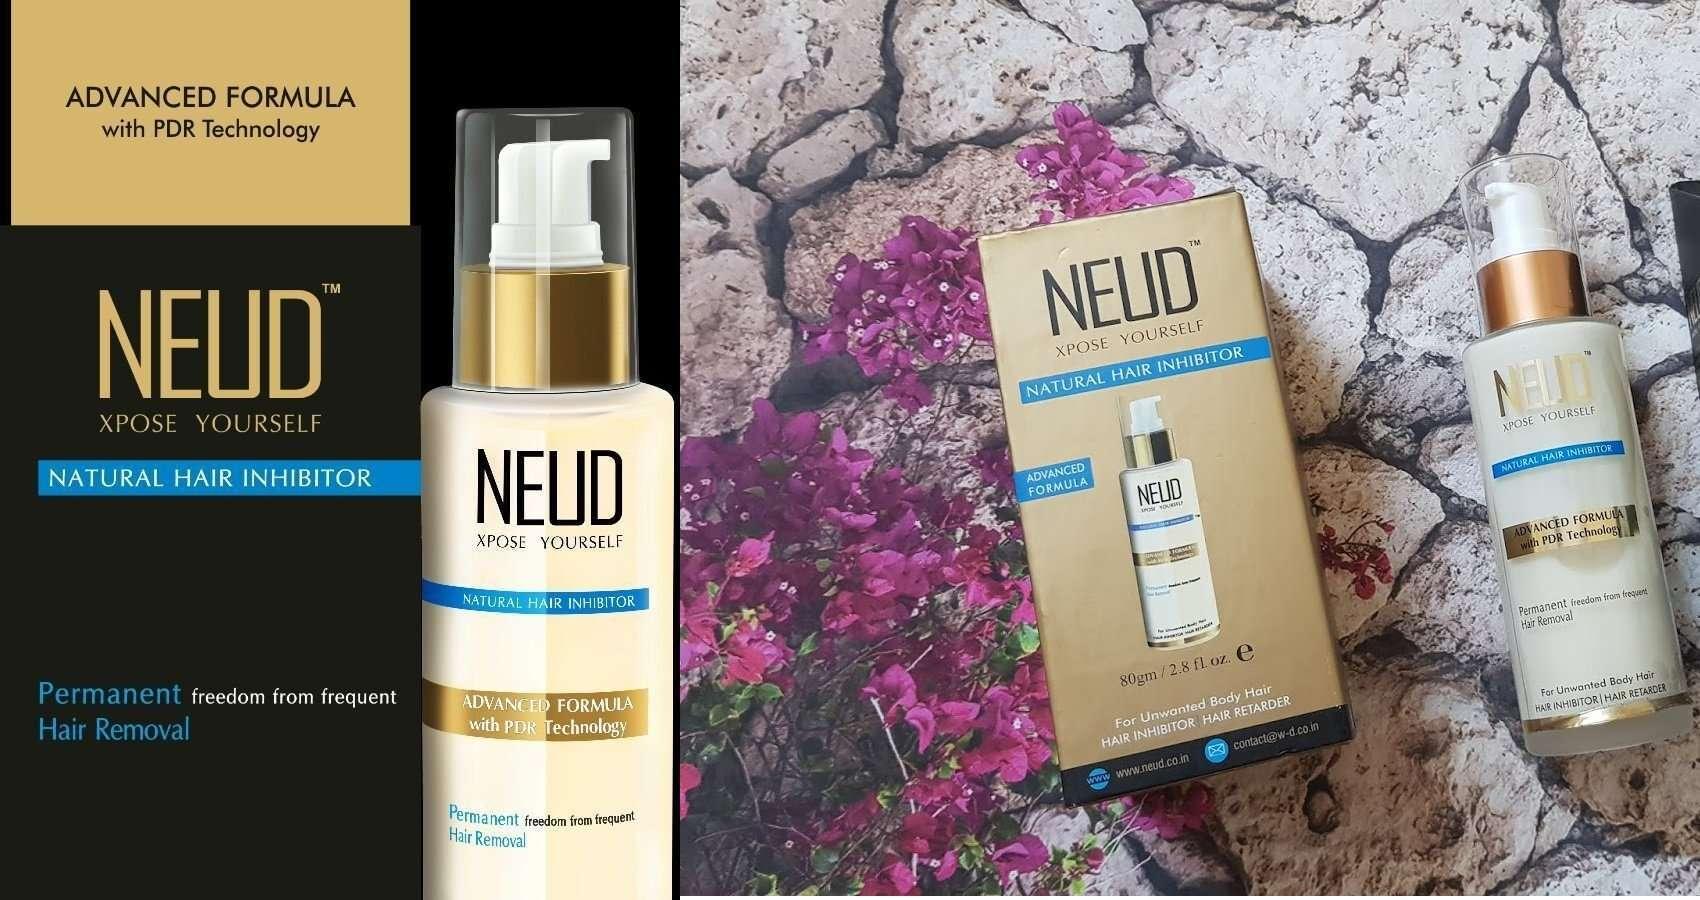 Neud Natural Inhibitor